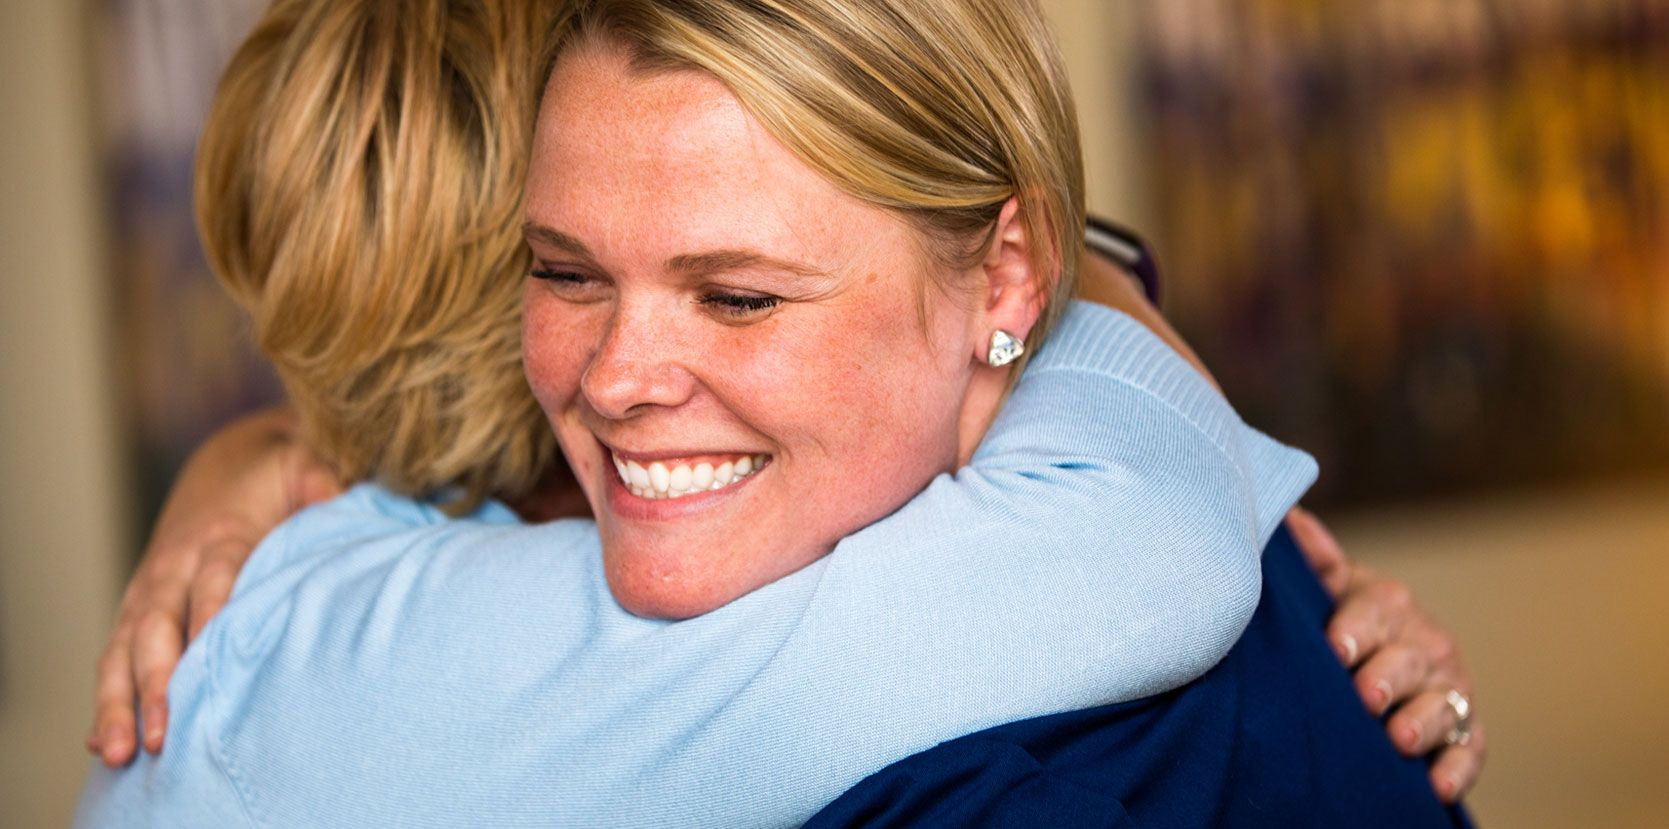 woman hugging her dentist